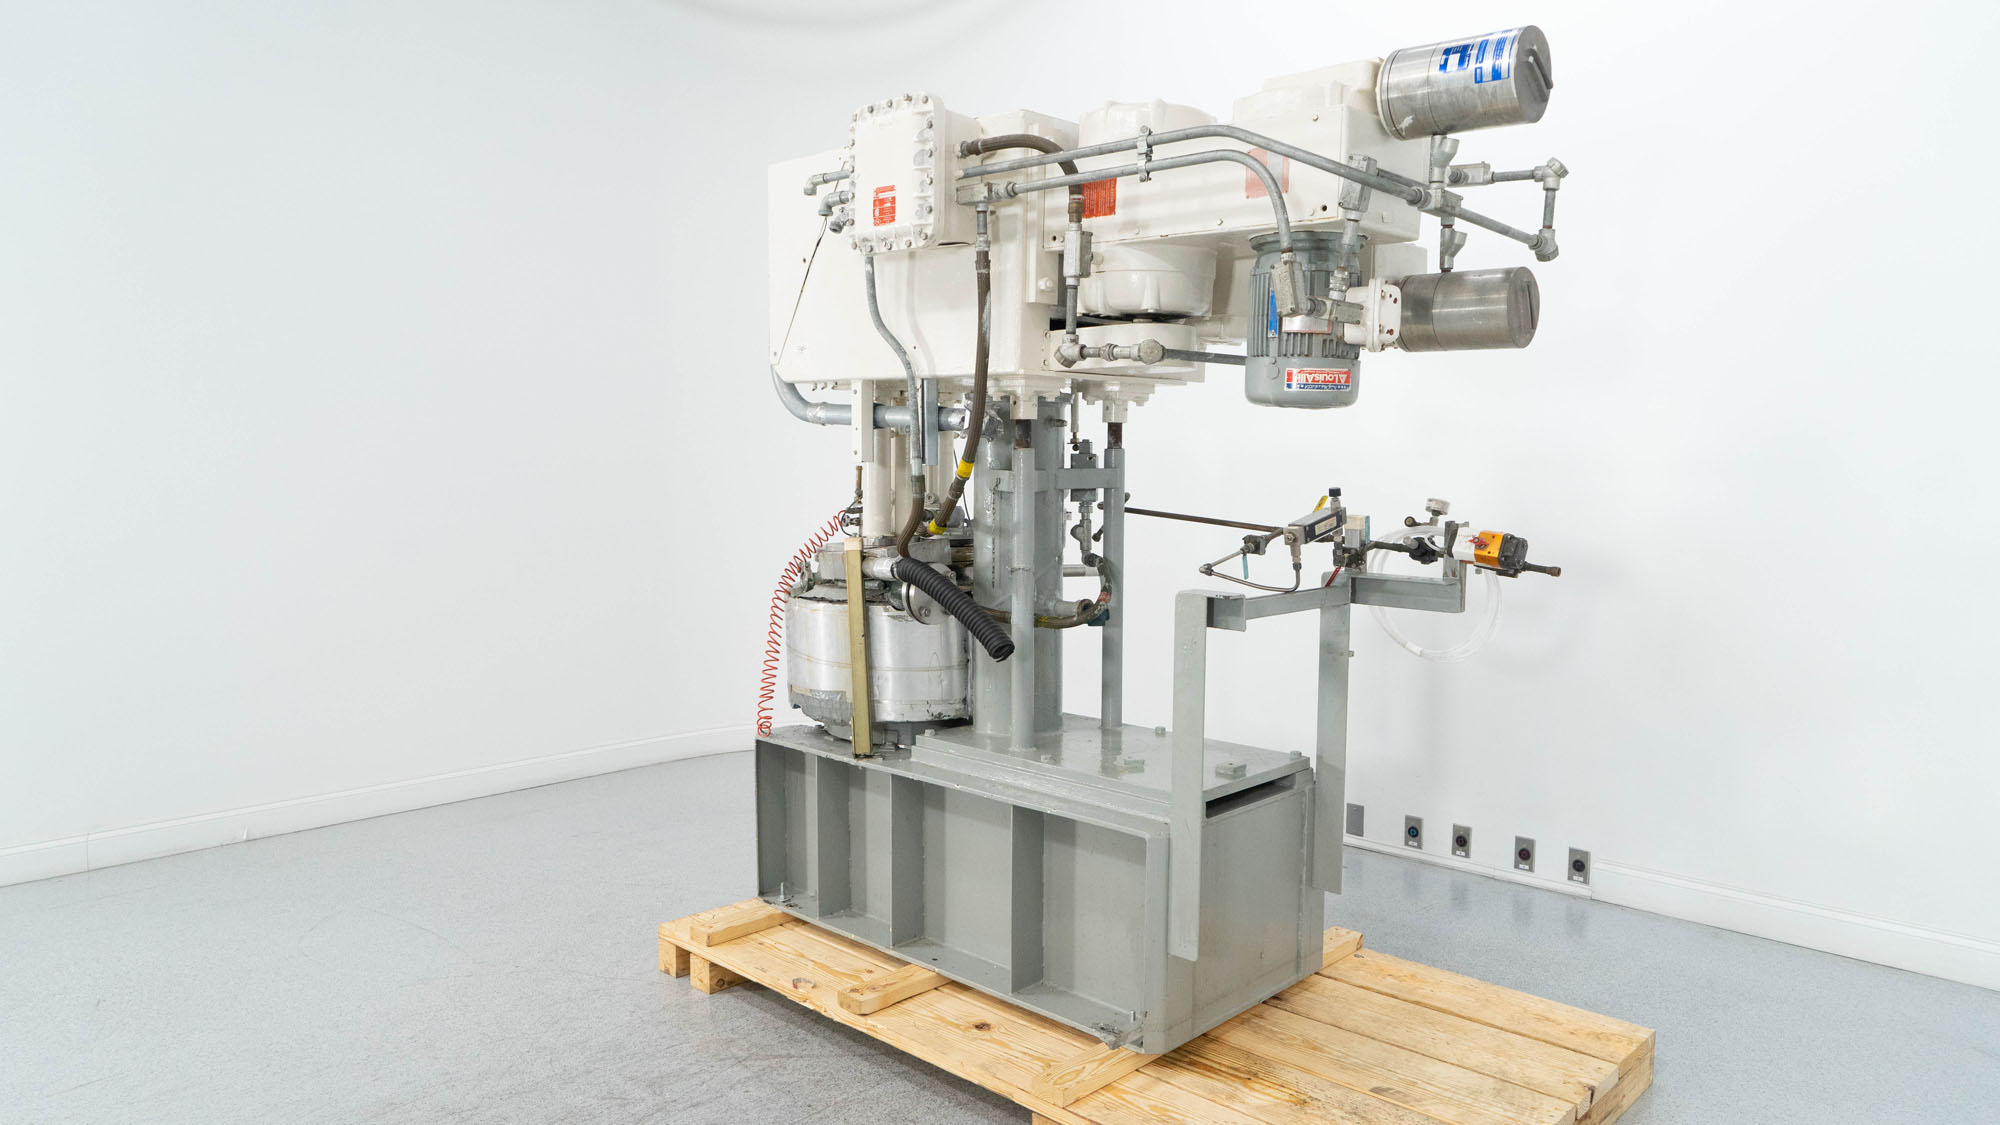 10 Gal Ross Planetary Mixer, Model PVM-10, S/S